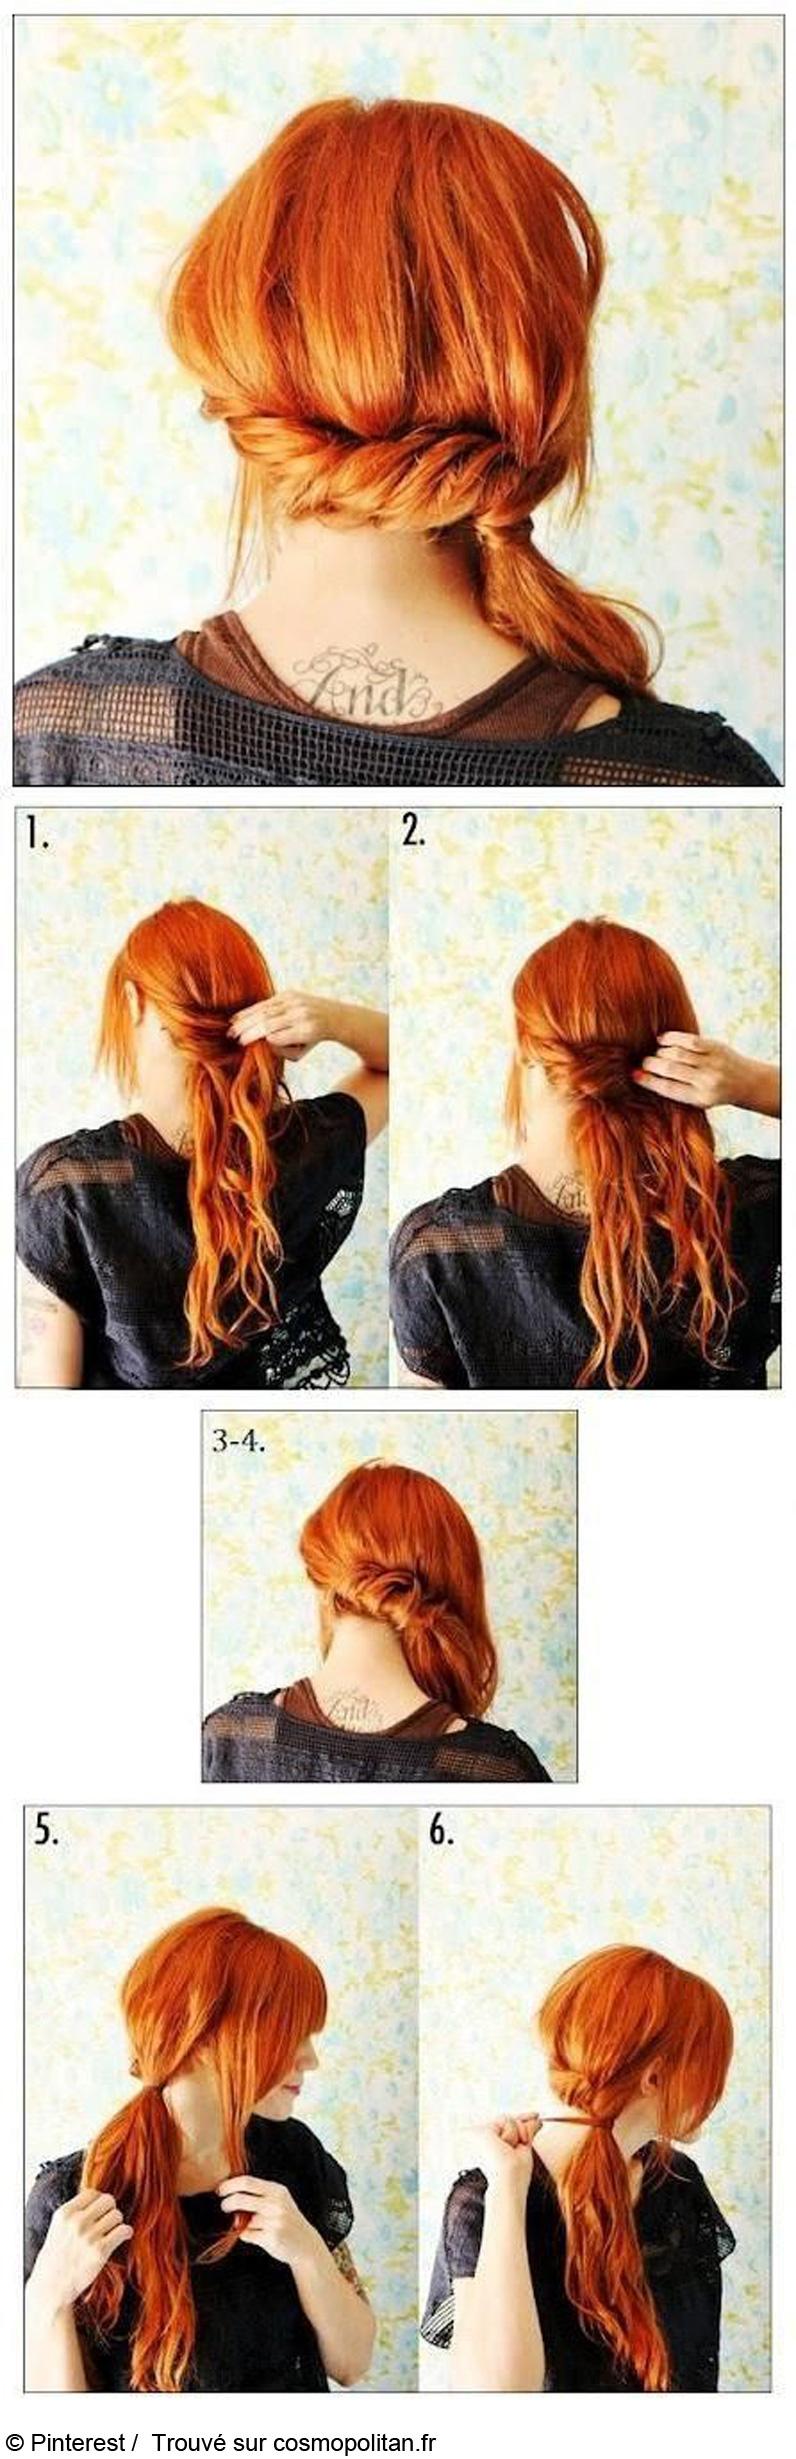 coiffure express et facile.jpg